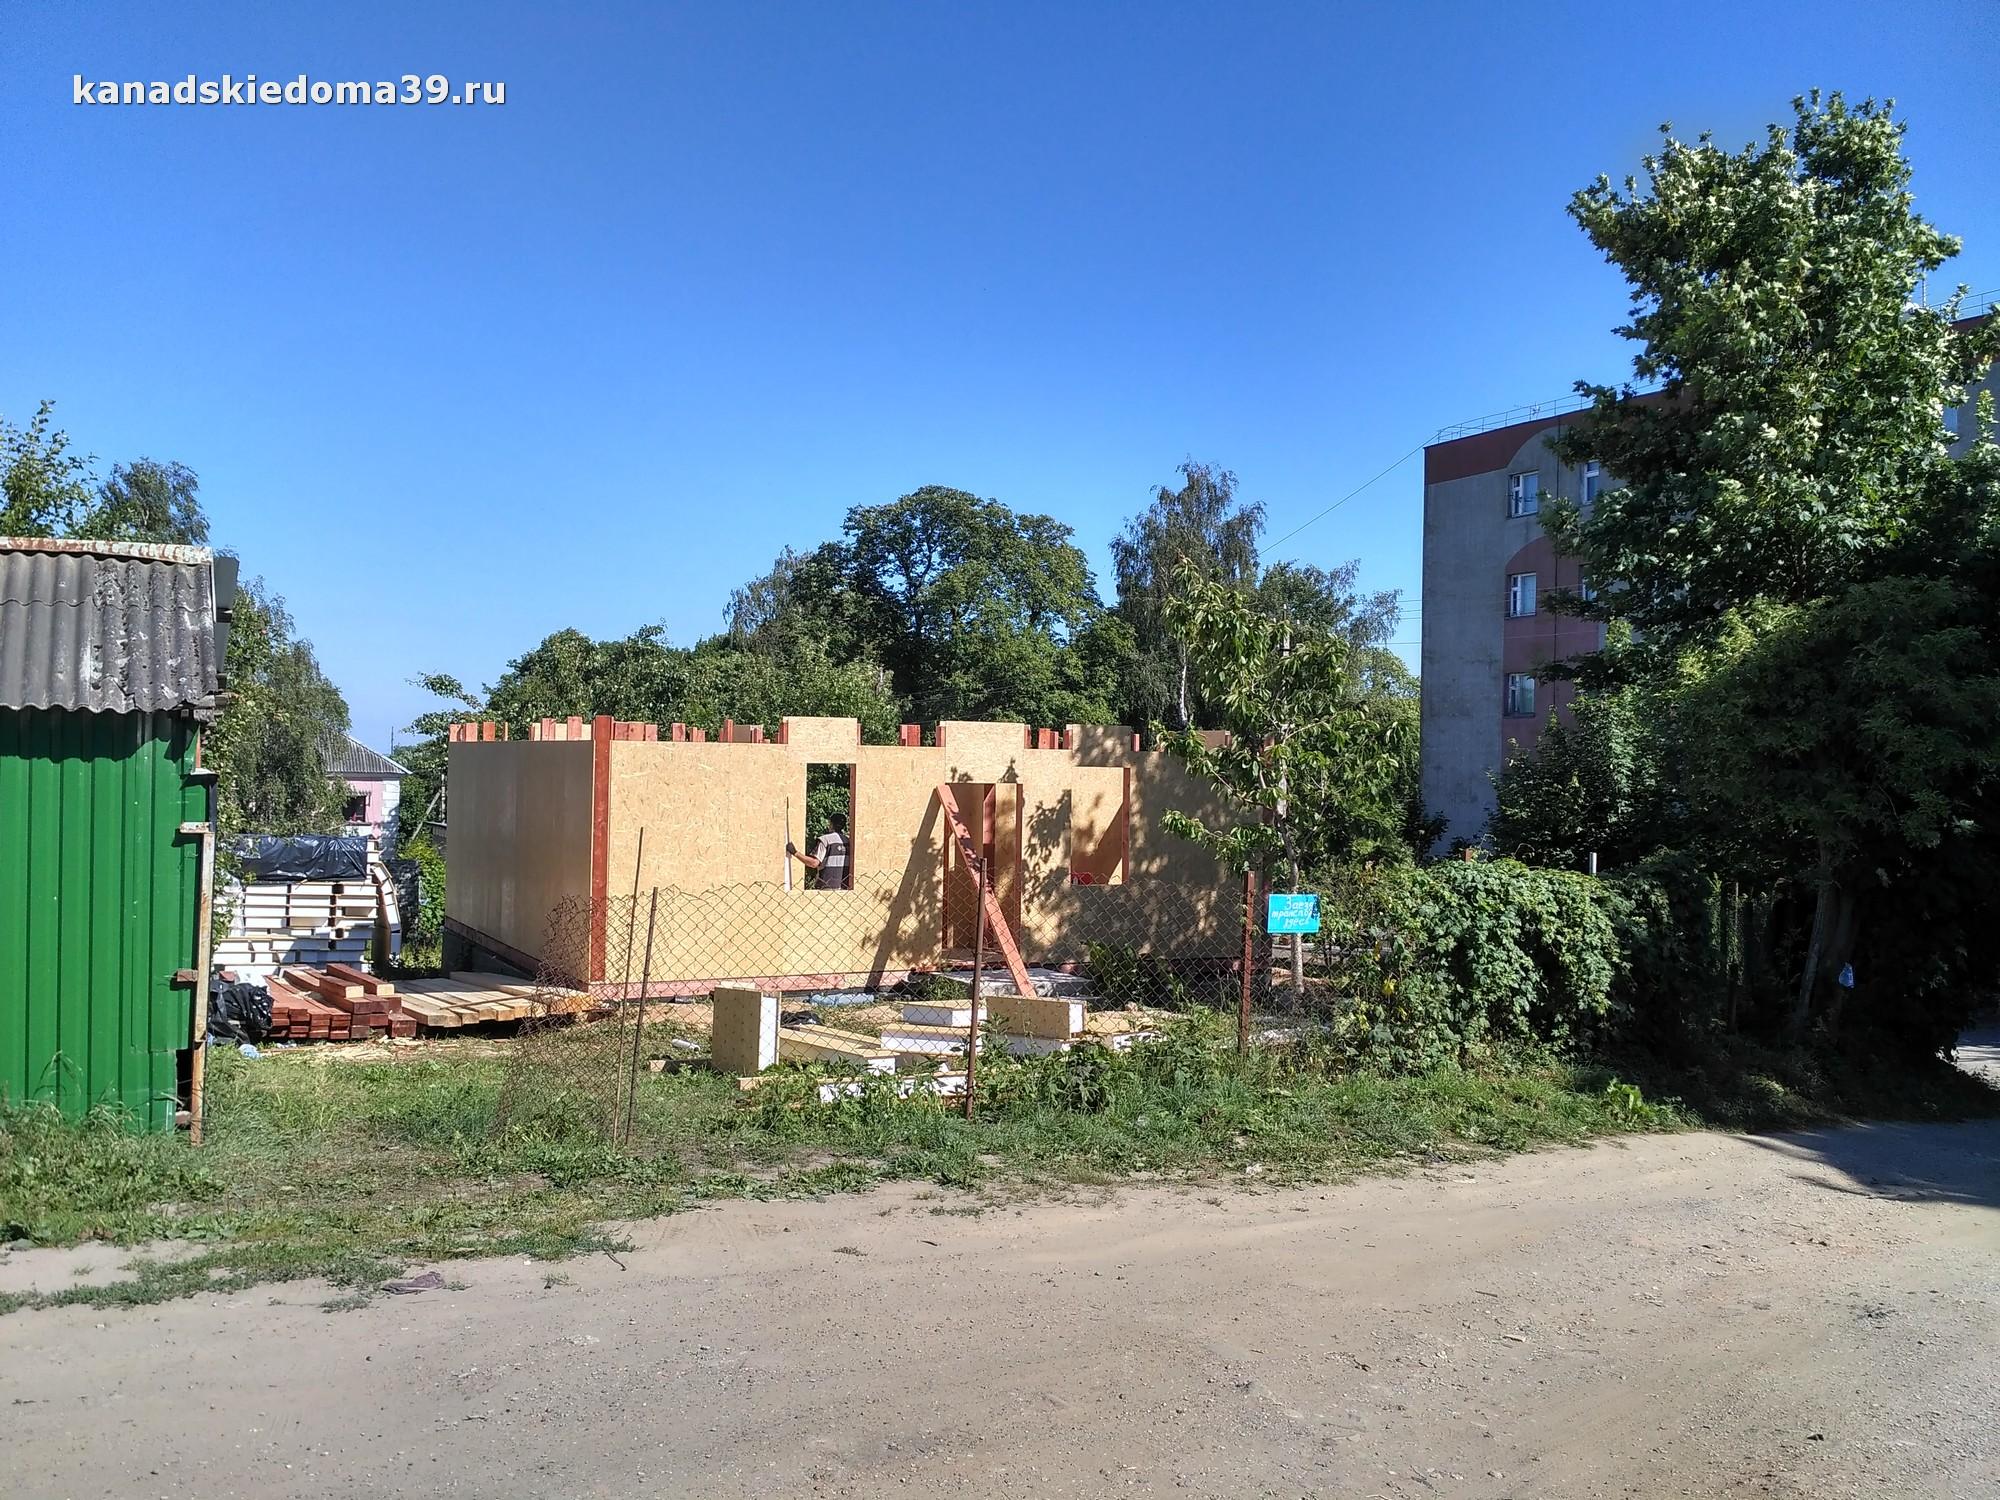 kd-sip-dom-baltiysk00058